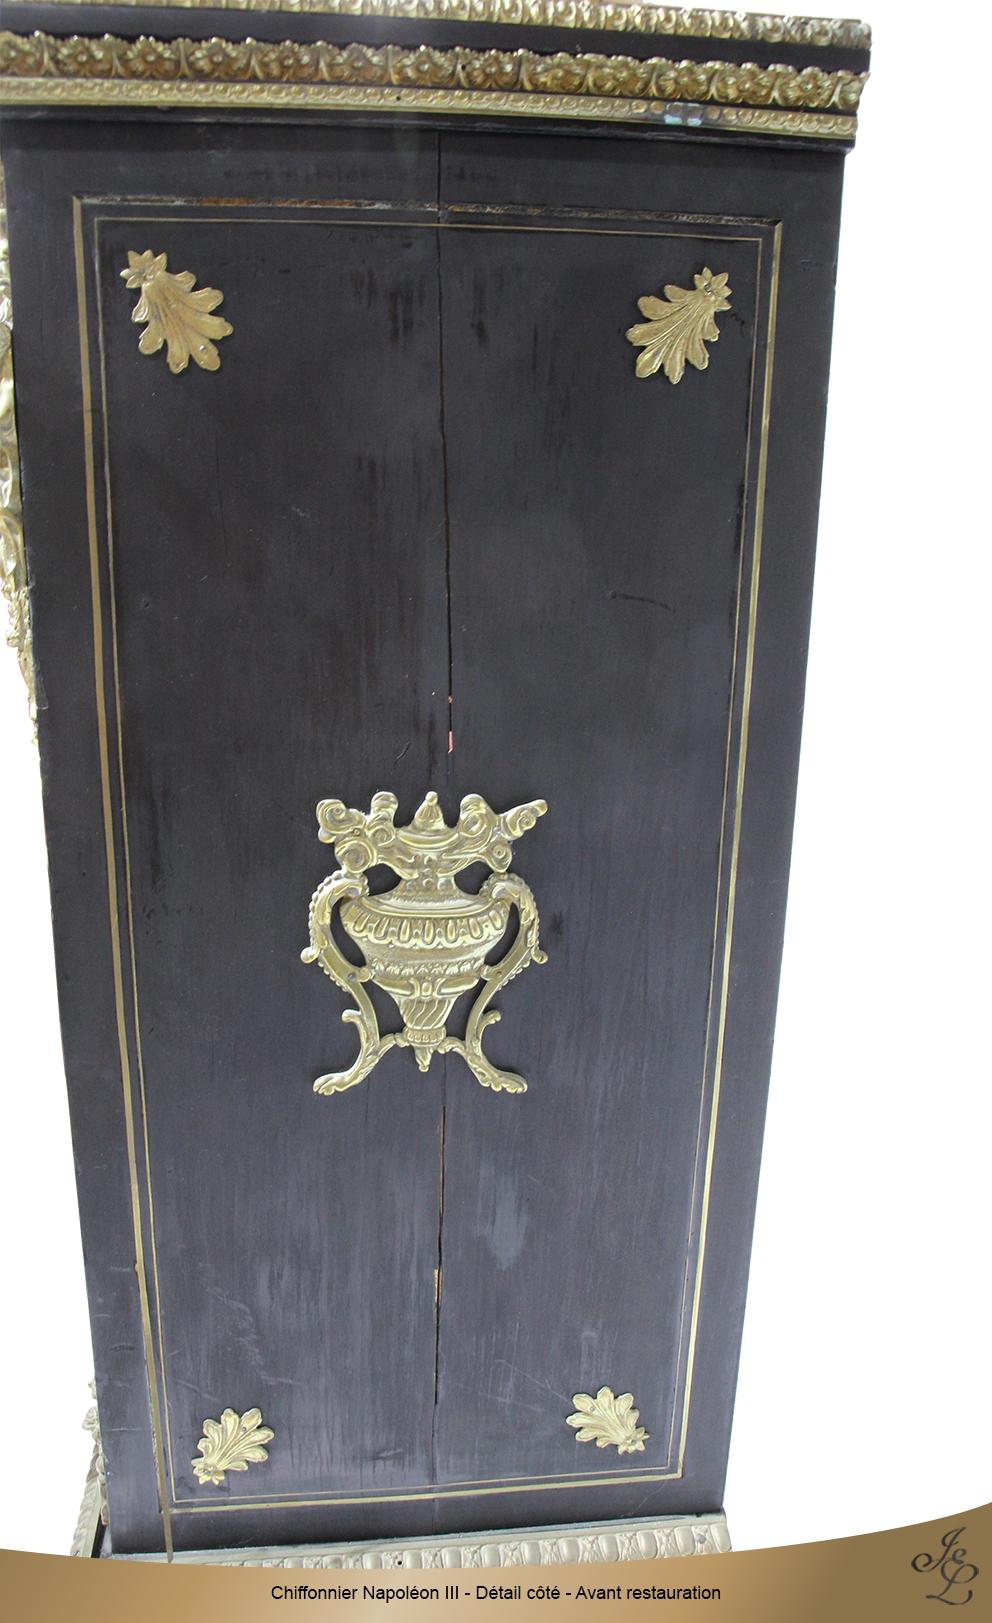 Chiffonnier Napoléon III - Détail côté - Avant restauration